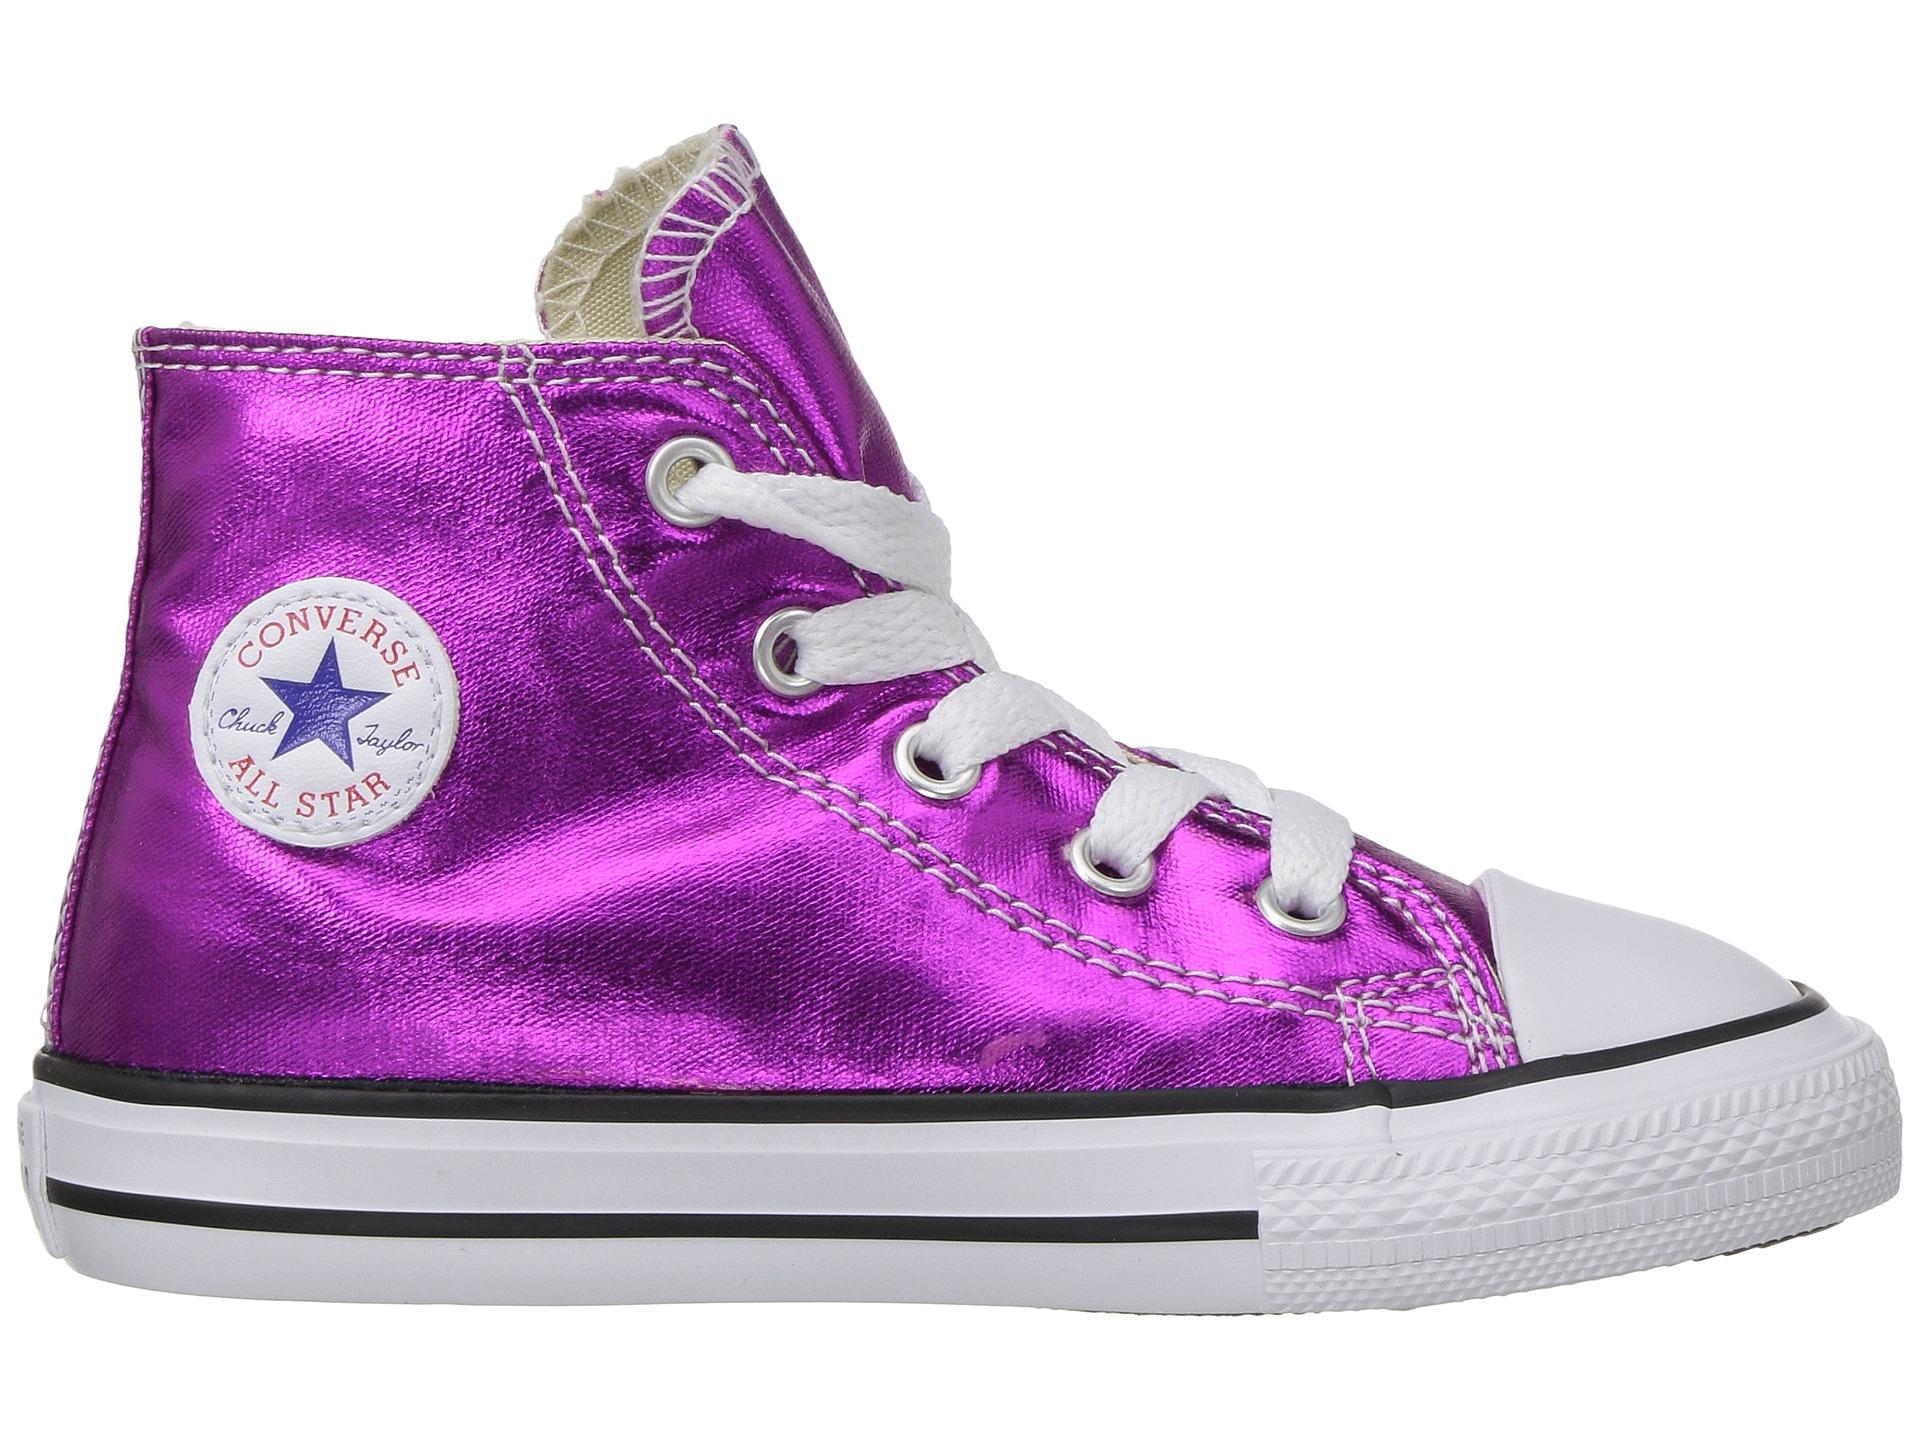 Converse Kids Chuck Taylor All Star Hi Metallic Infant